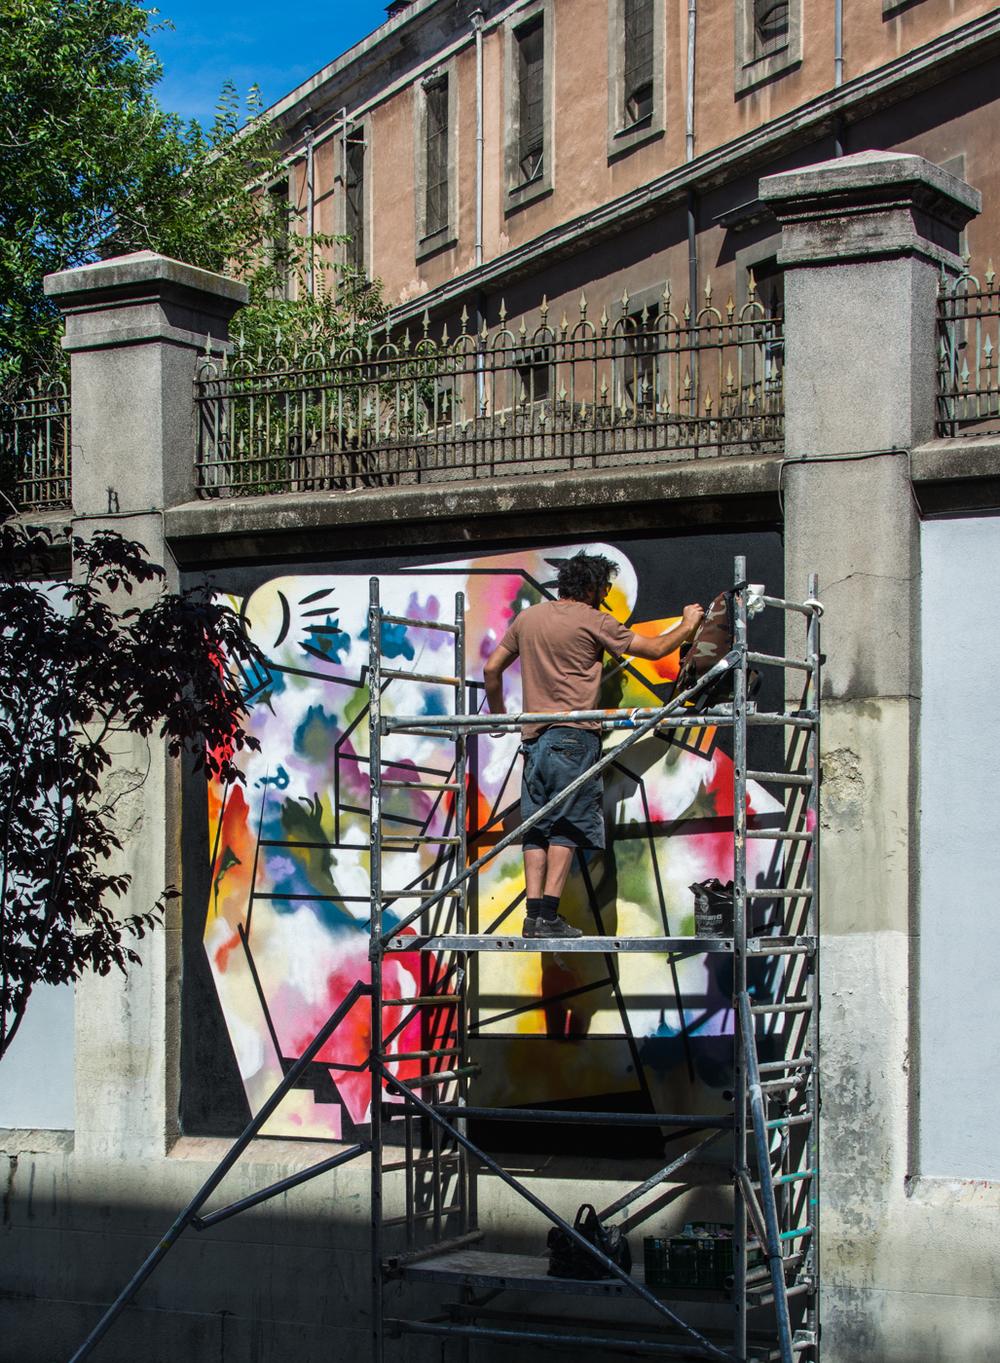 Digo Diego - MurosTabacalera by Guillermo de la Madrid - Madrid Street Art Project -17-003.jpg